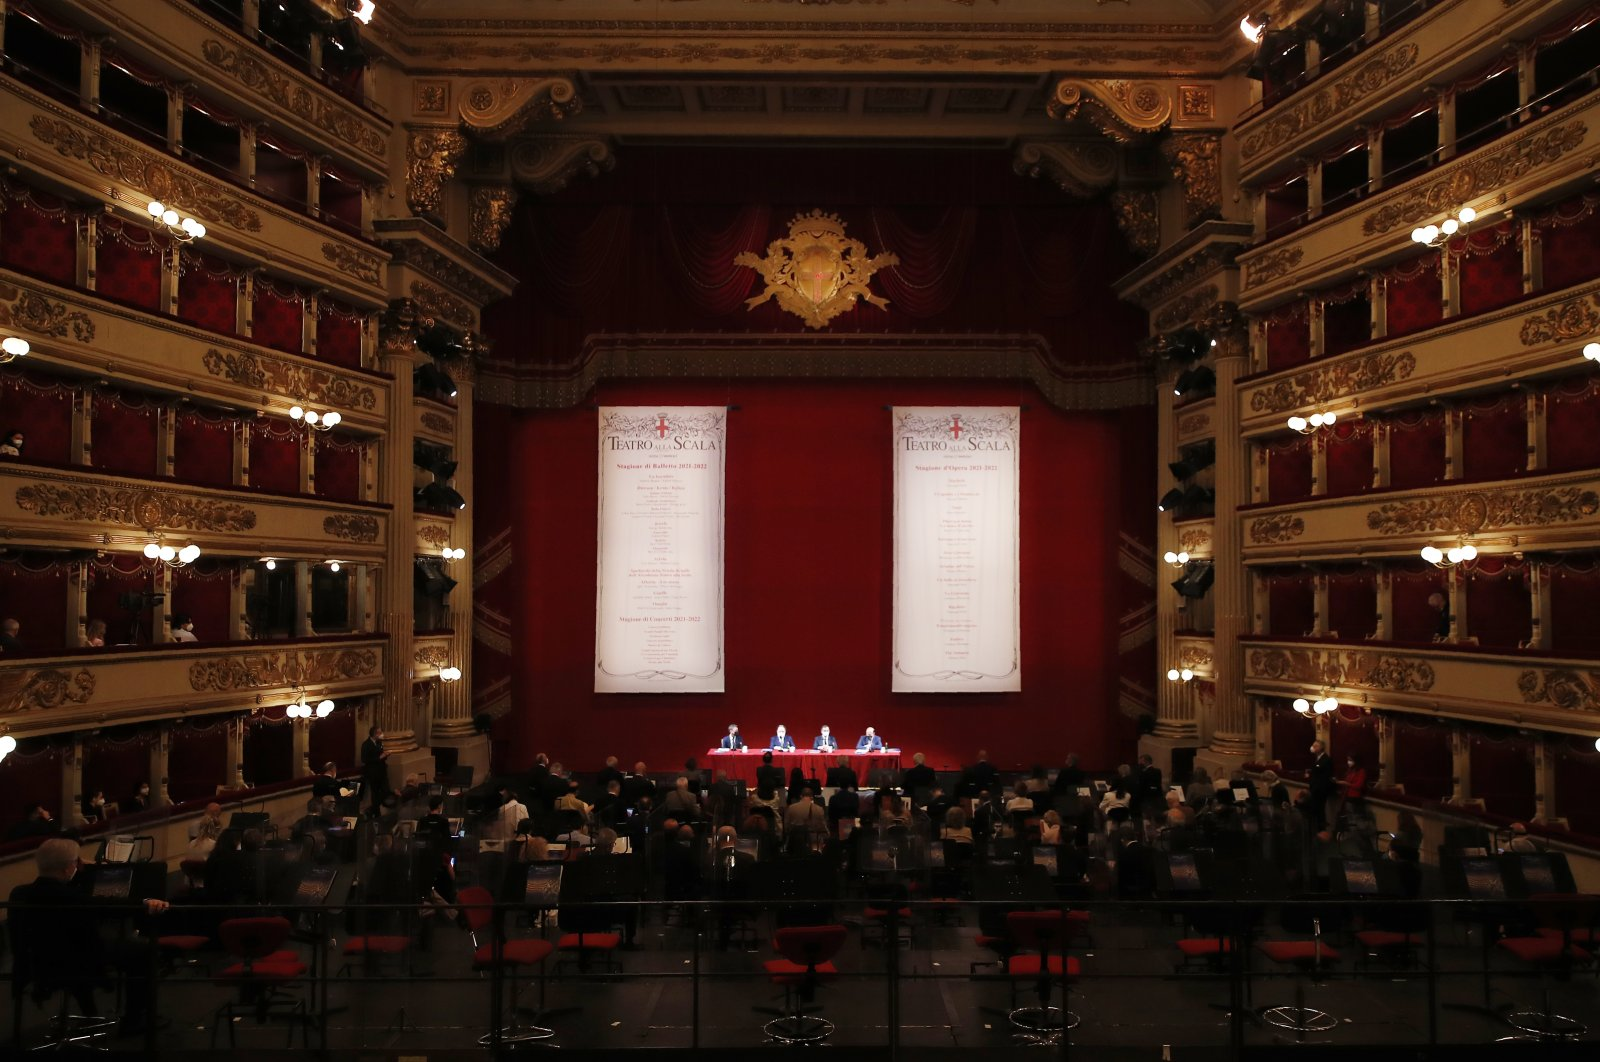 Raise the curtains: Milan's La Scala announces new season in hope